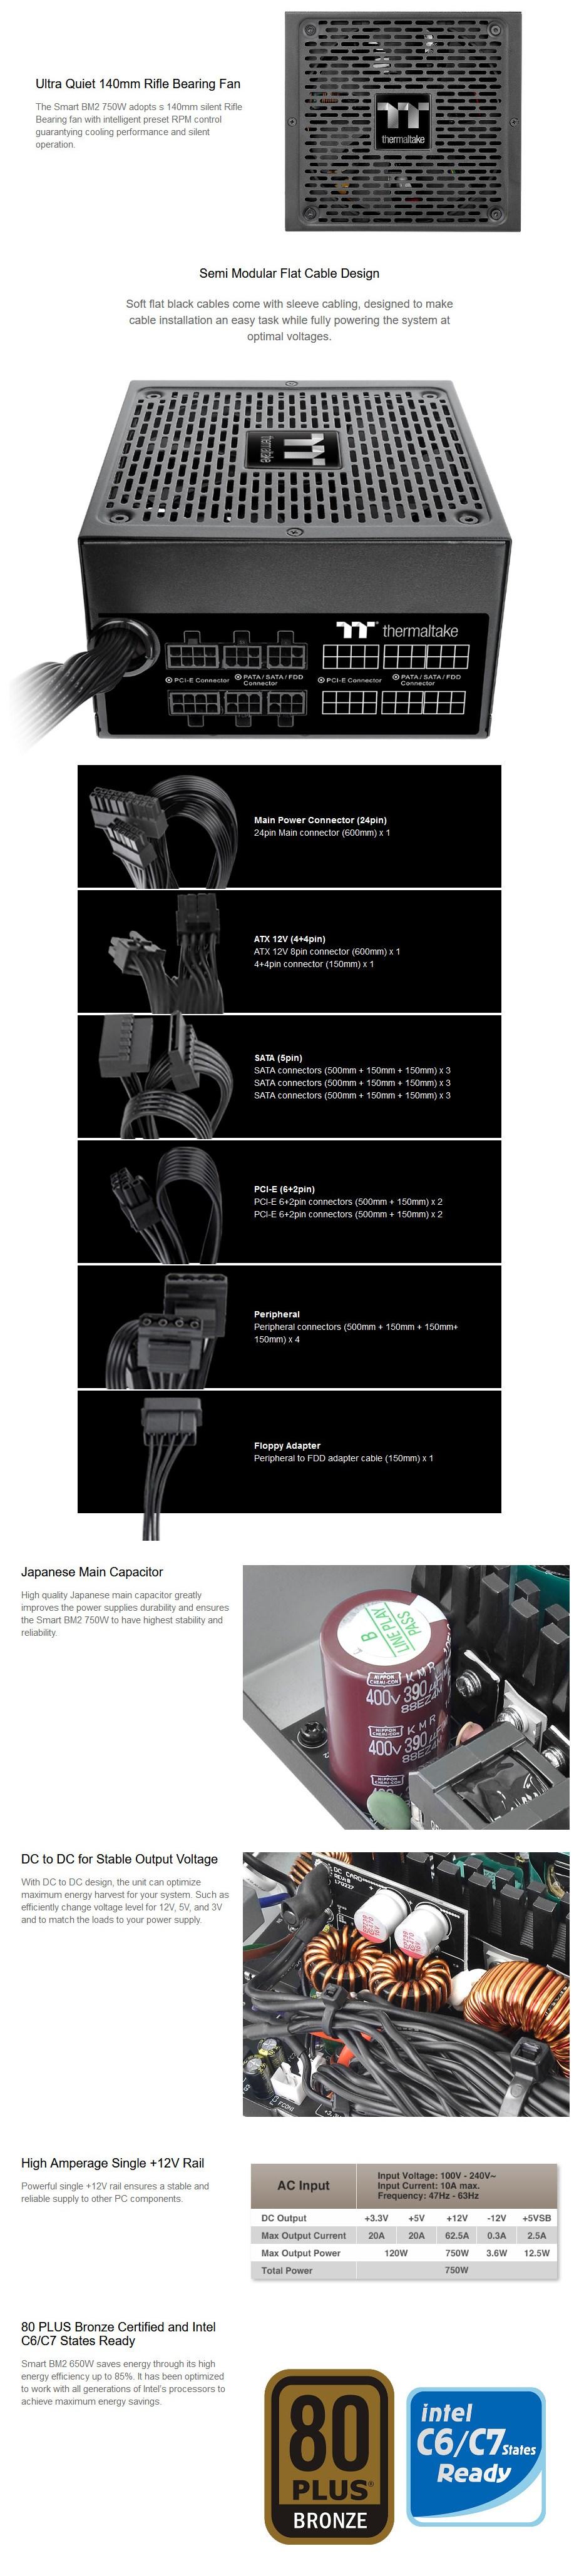 Thermaltake Smart BM2 Series 750W 80+ Bronze Semi-Modular Power Supply - Overview 1